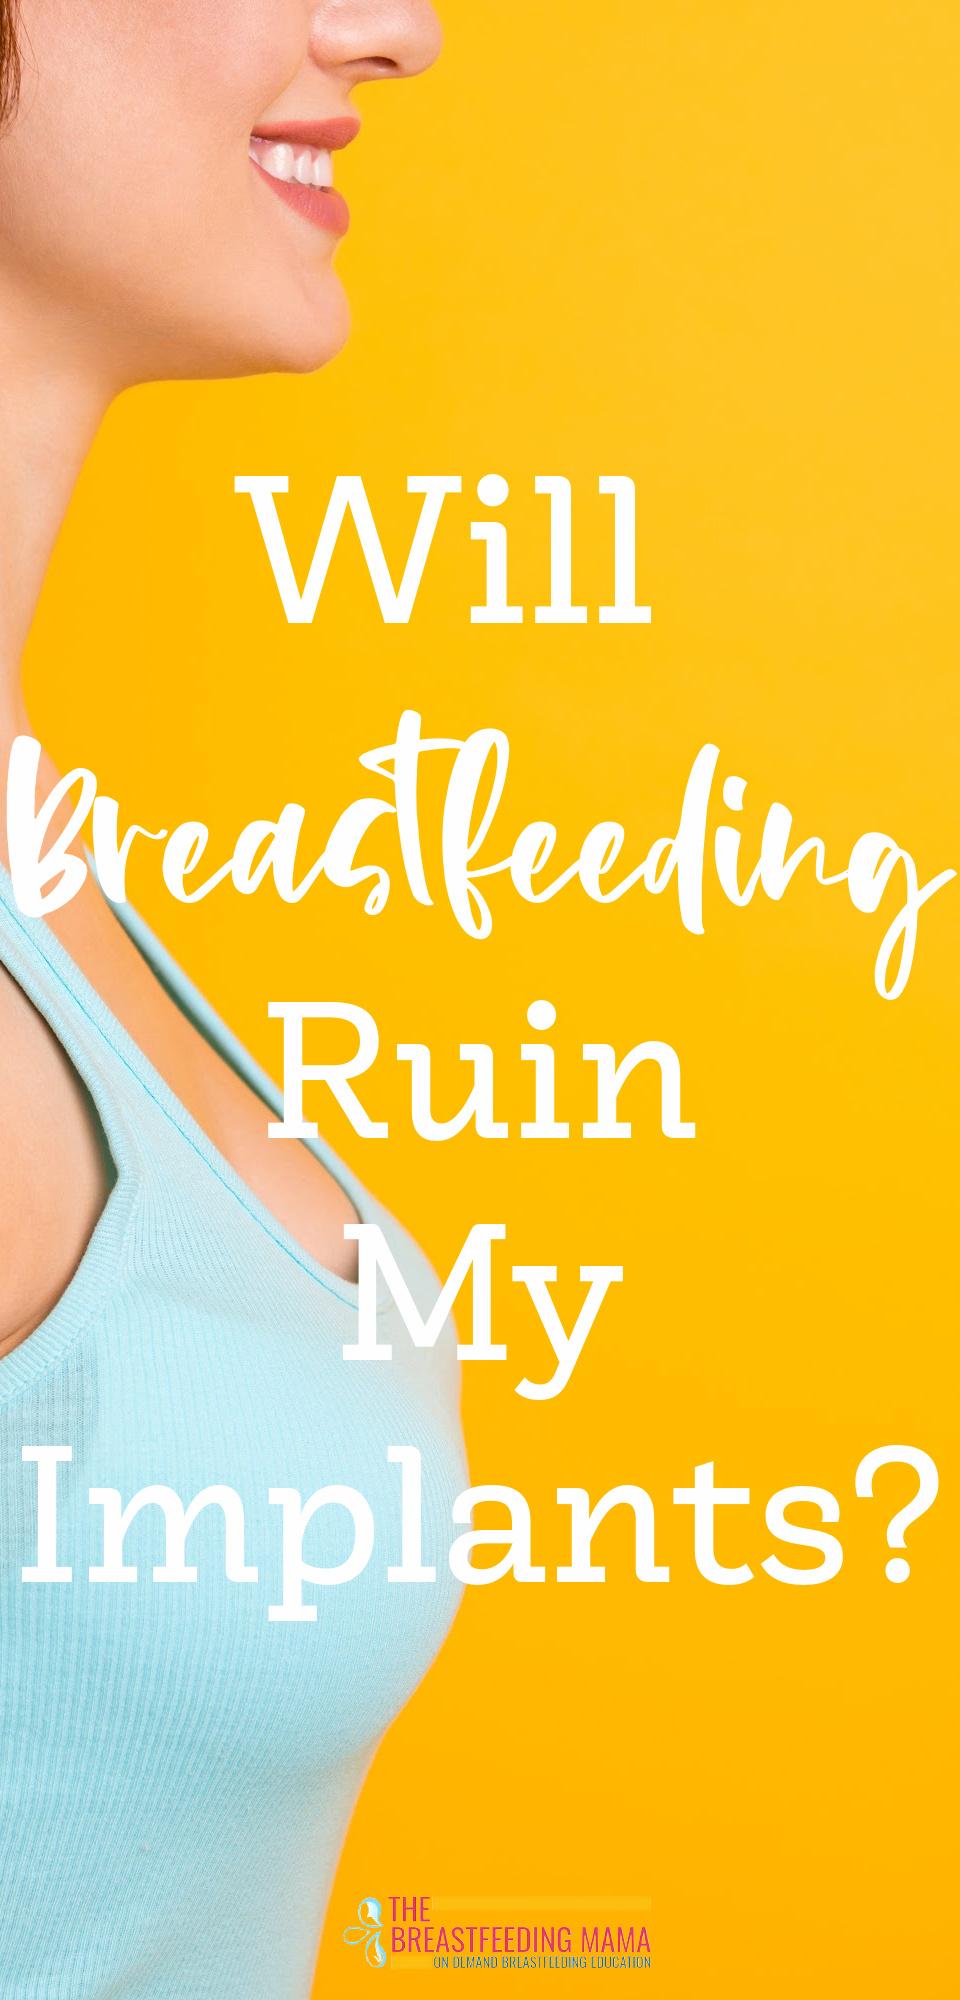 Will Breastfeeding Ruin My Implants?